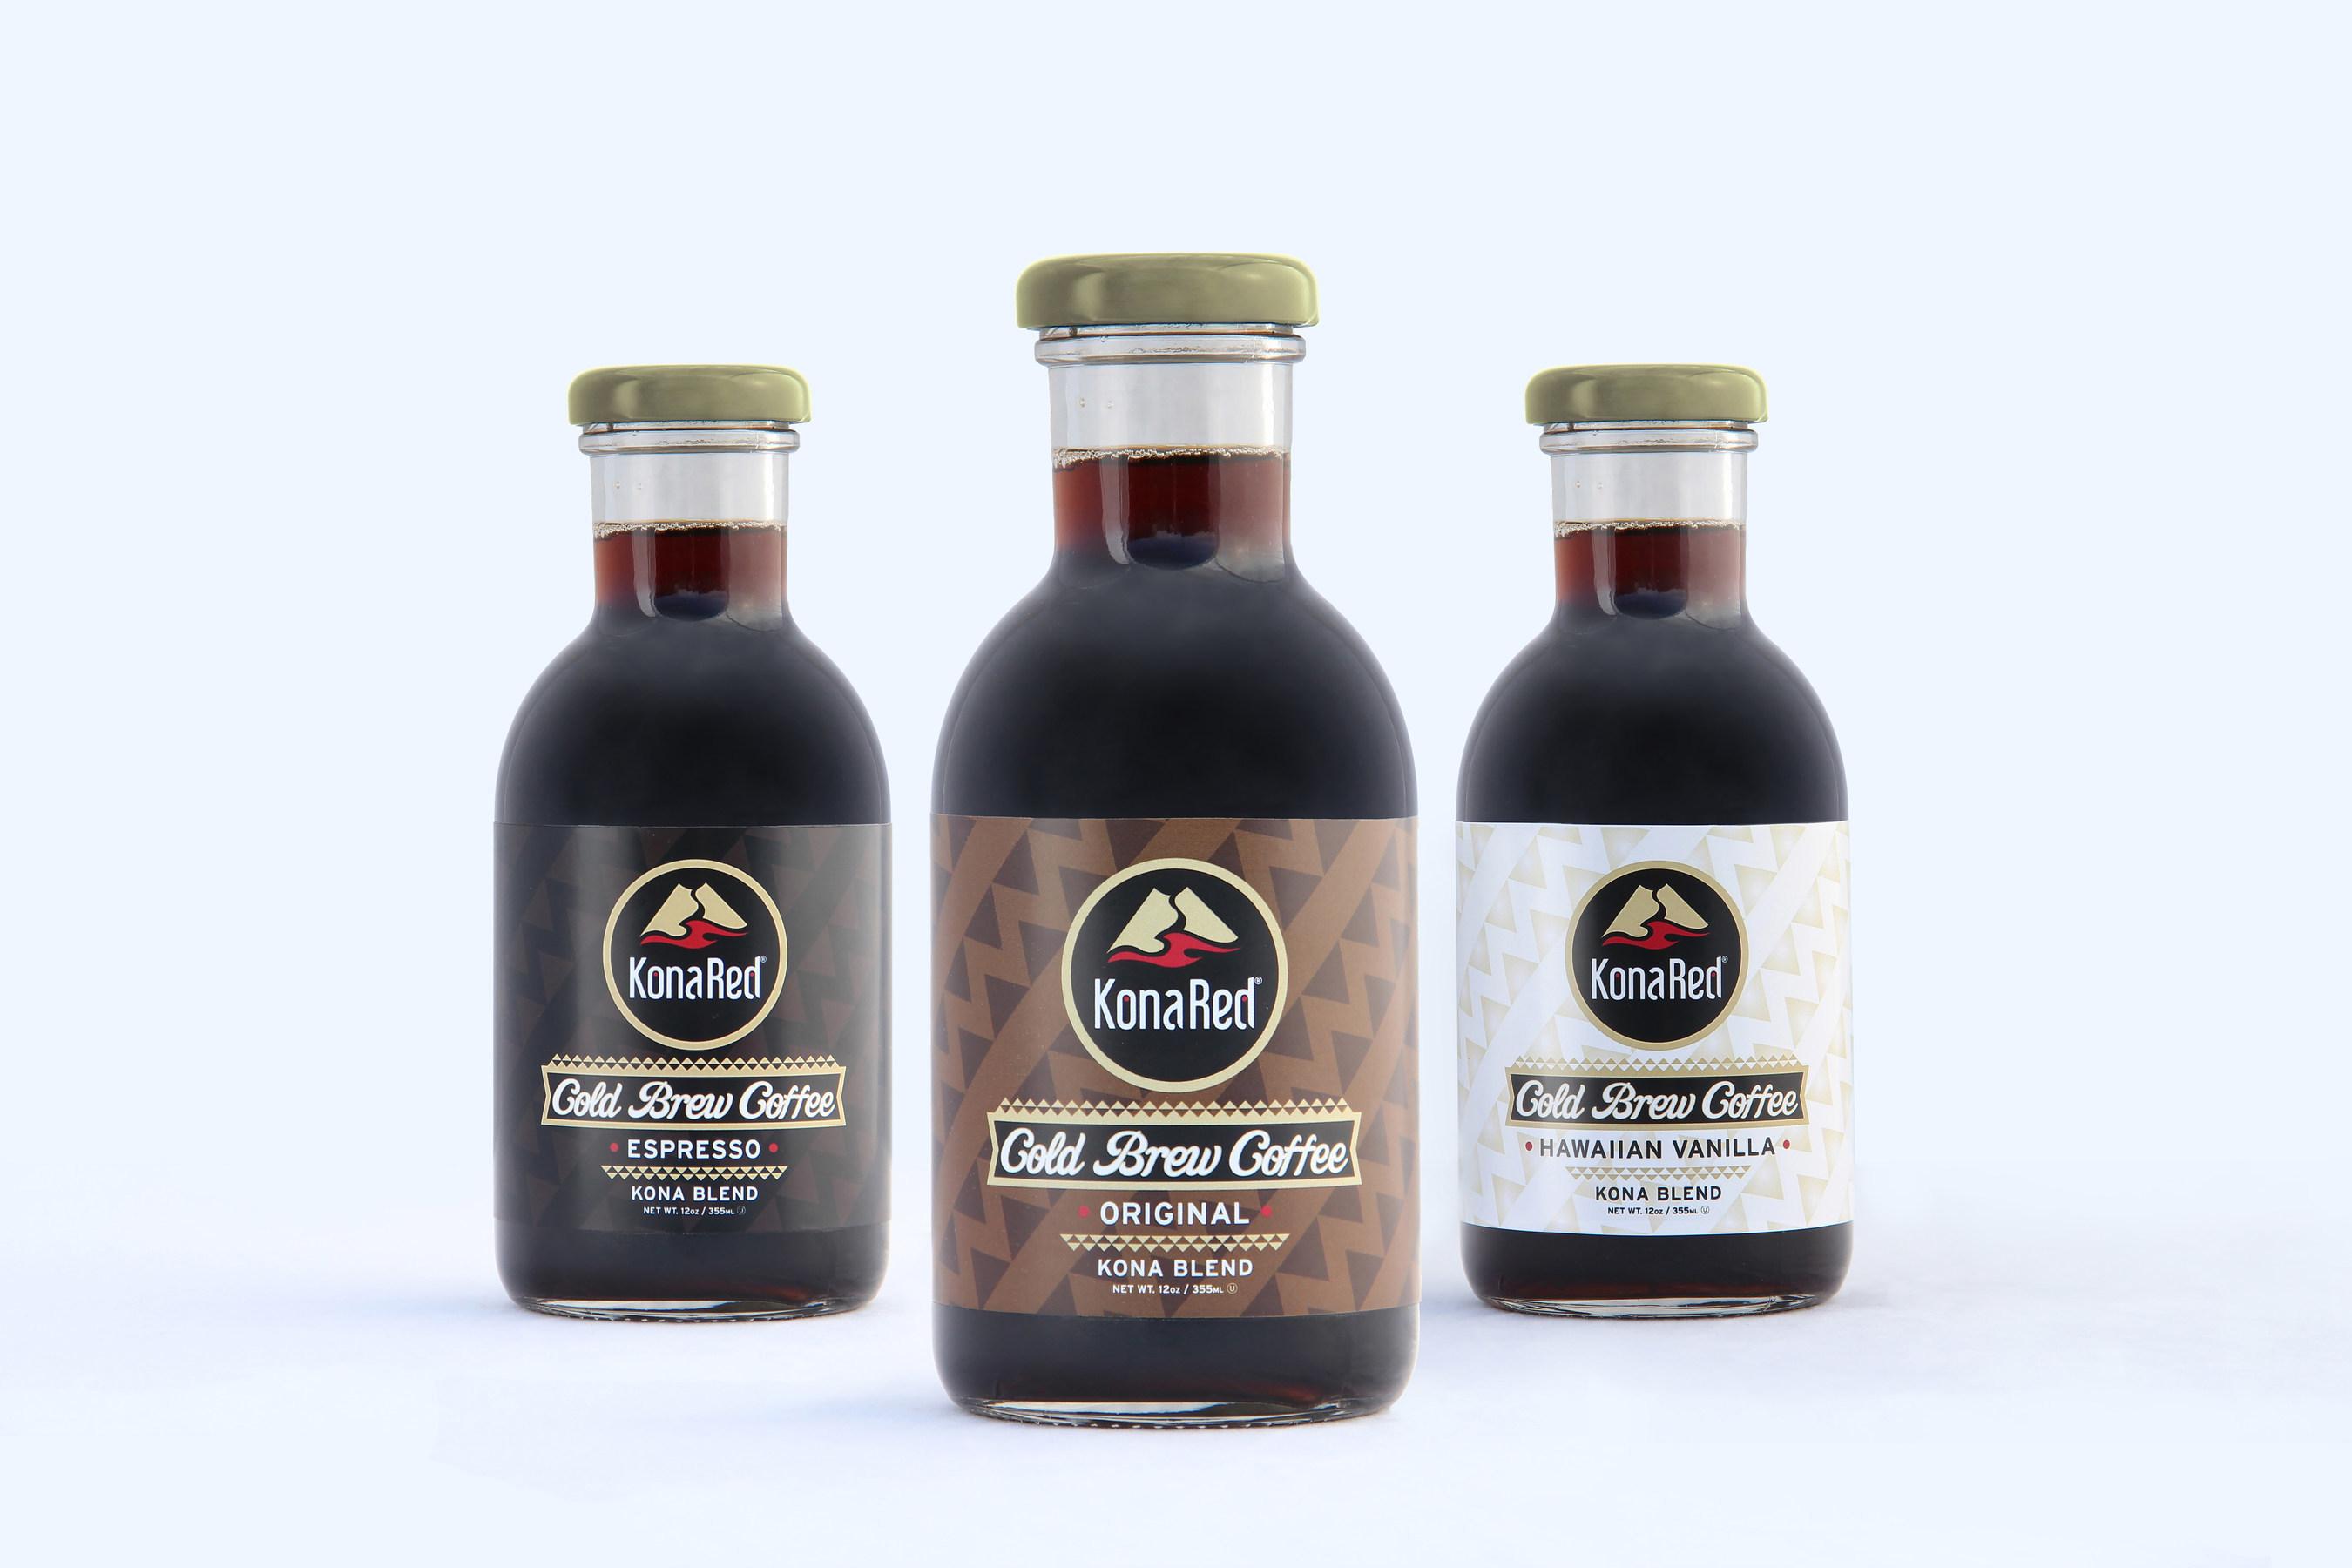 KonaRed Ready to Drink Cold Brew Coffee infused with Hawaiian Coffee Fruit (PRNewsFoto/KonaRed Corporation)